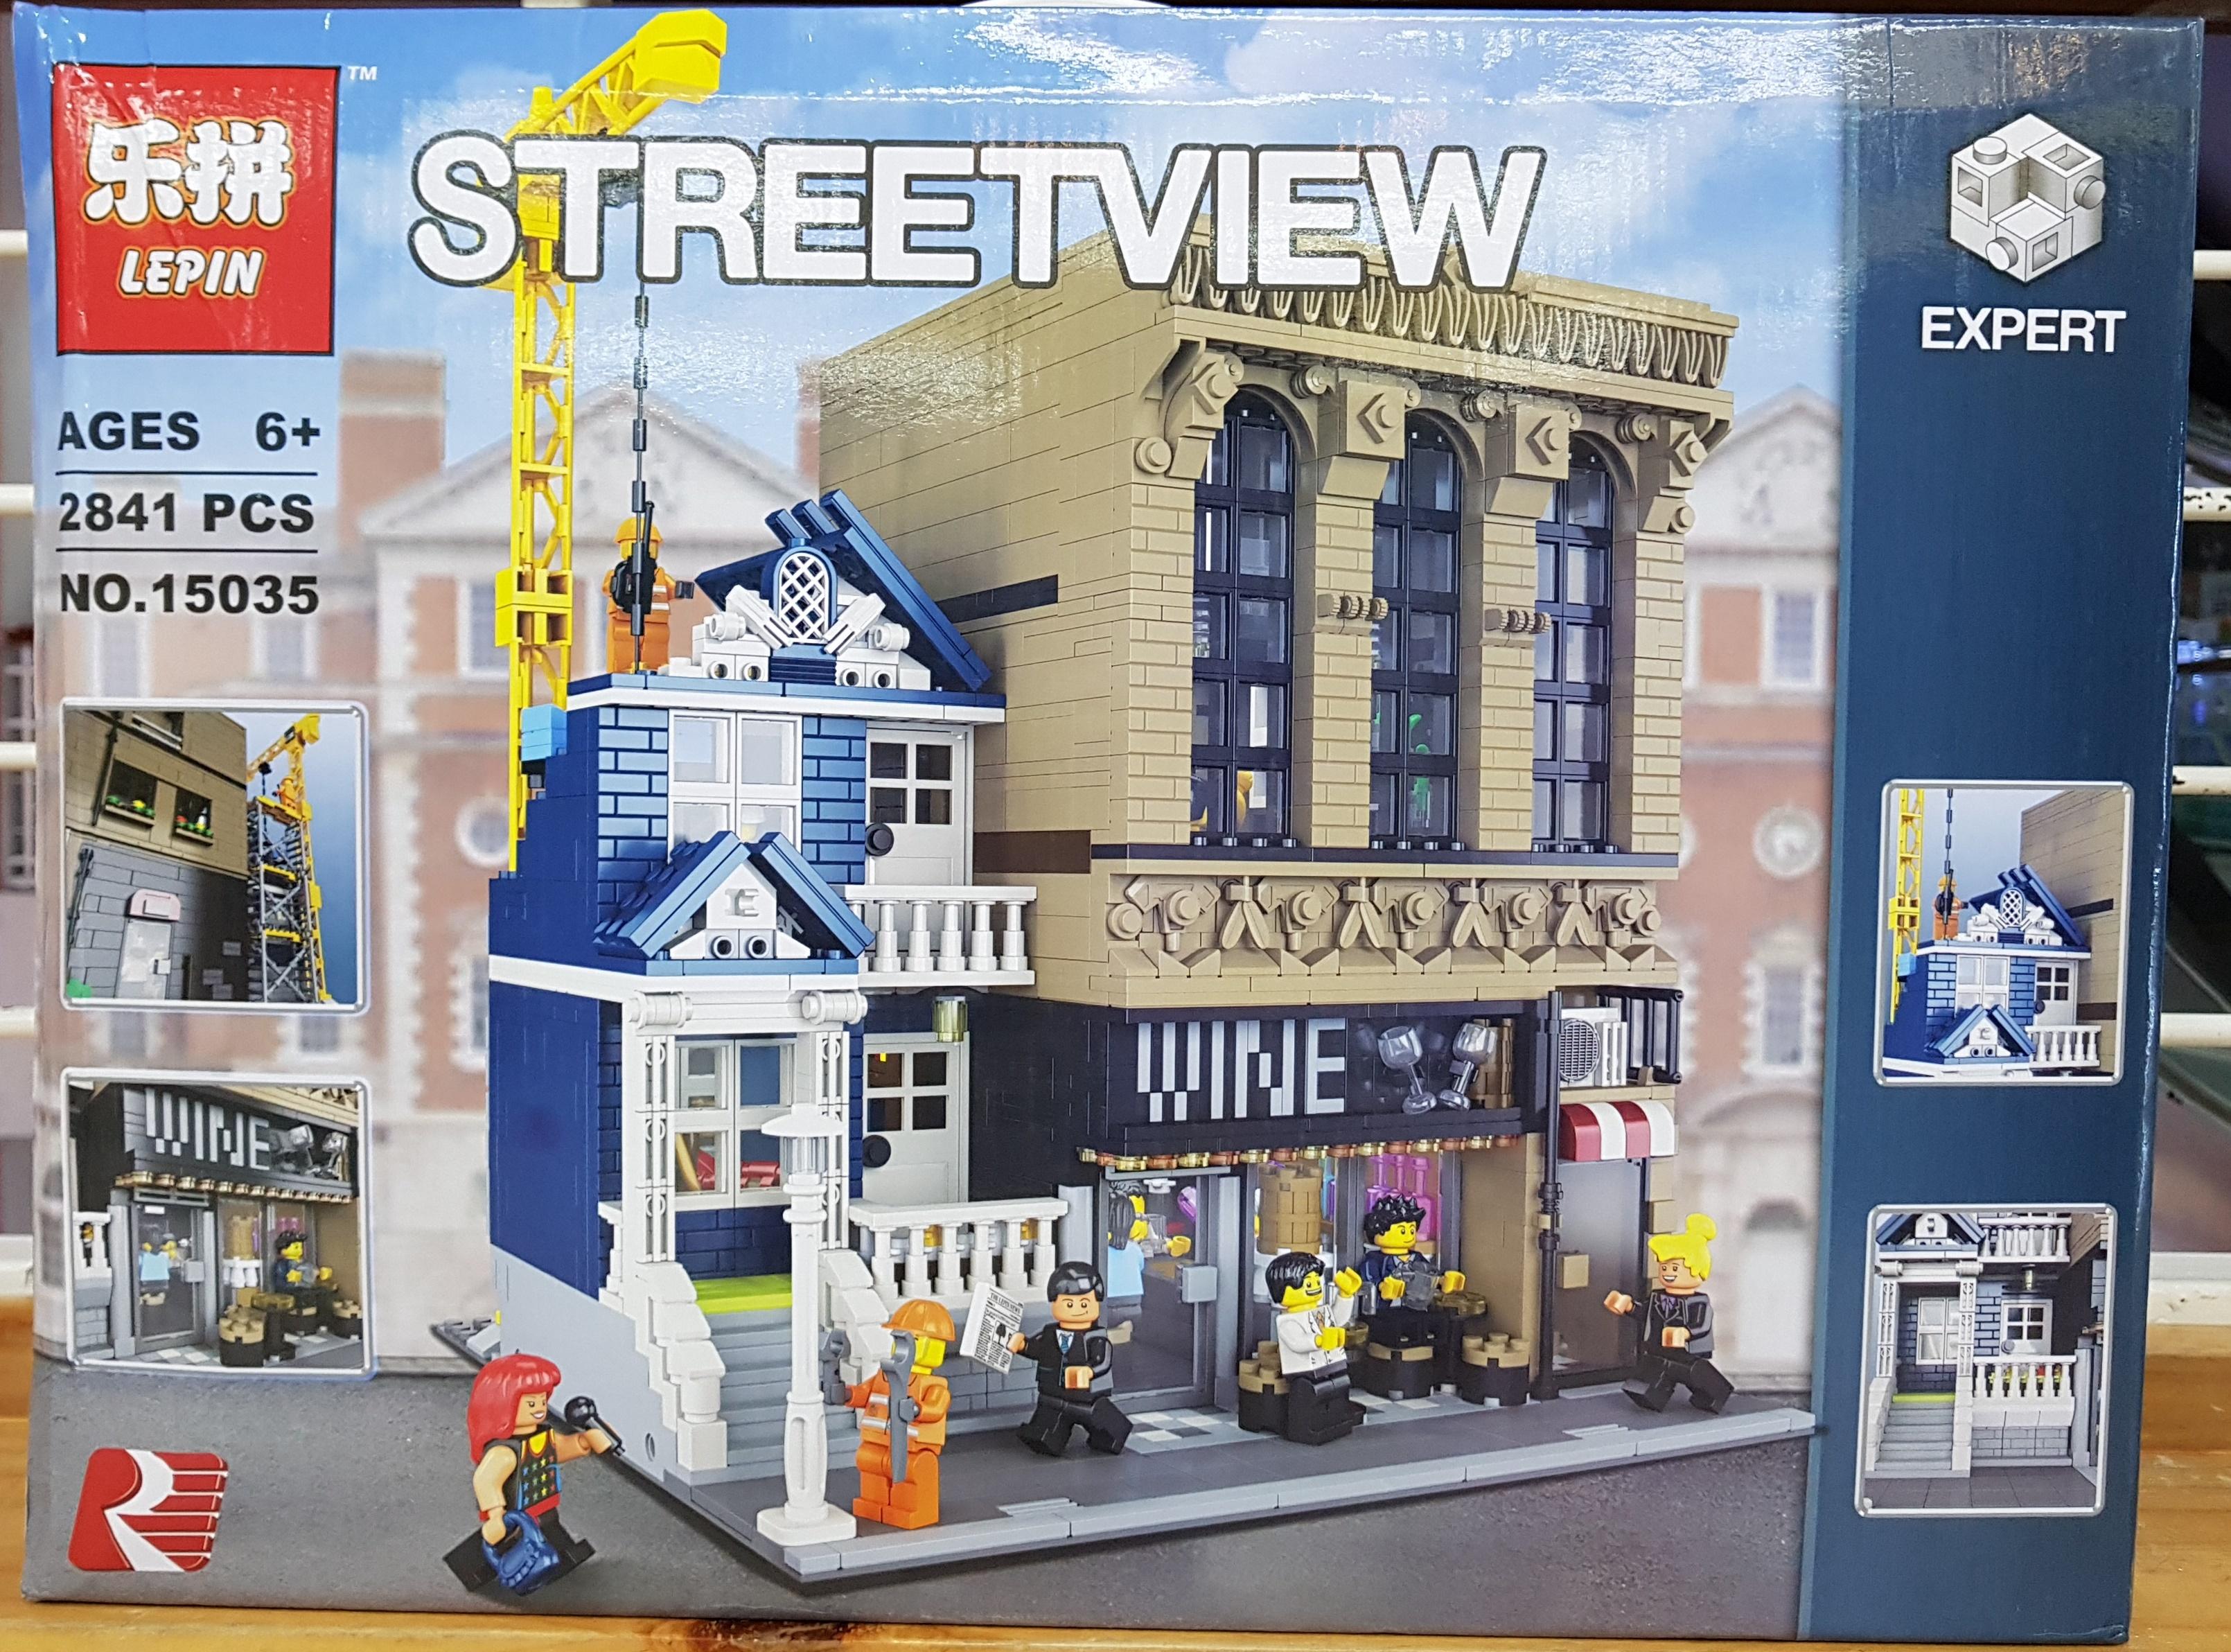 LEPIN STREETVIEW 15035 (2841ชิ้น)